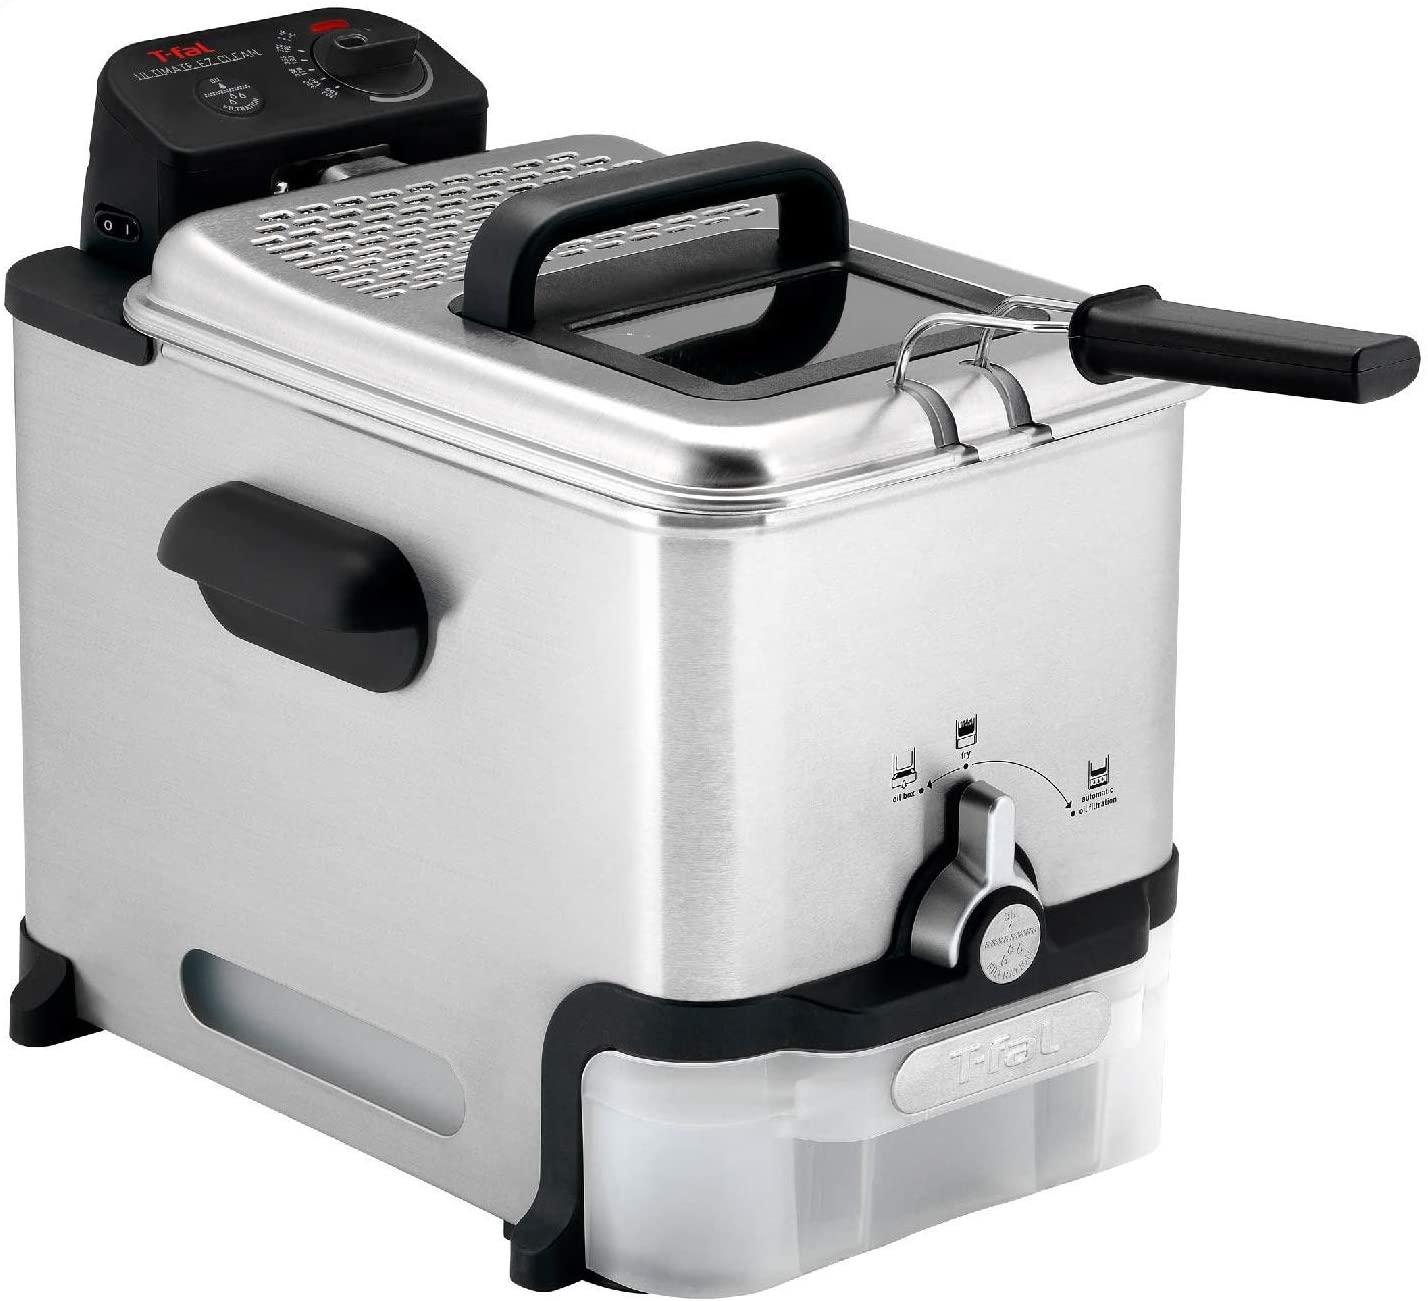 T-fal Deep Fryer with Basket, Stainless Steel, Easy to Clean Deep Fryer, Oil Filtration, 2.6-Pound, Silver, Model FR8000 [EZ Clean Deep Fryer] $74.99